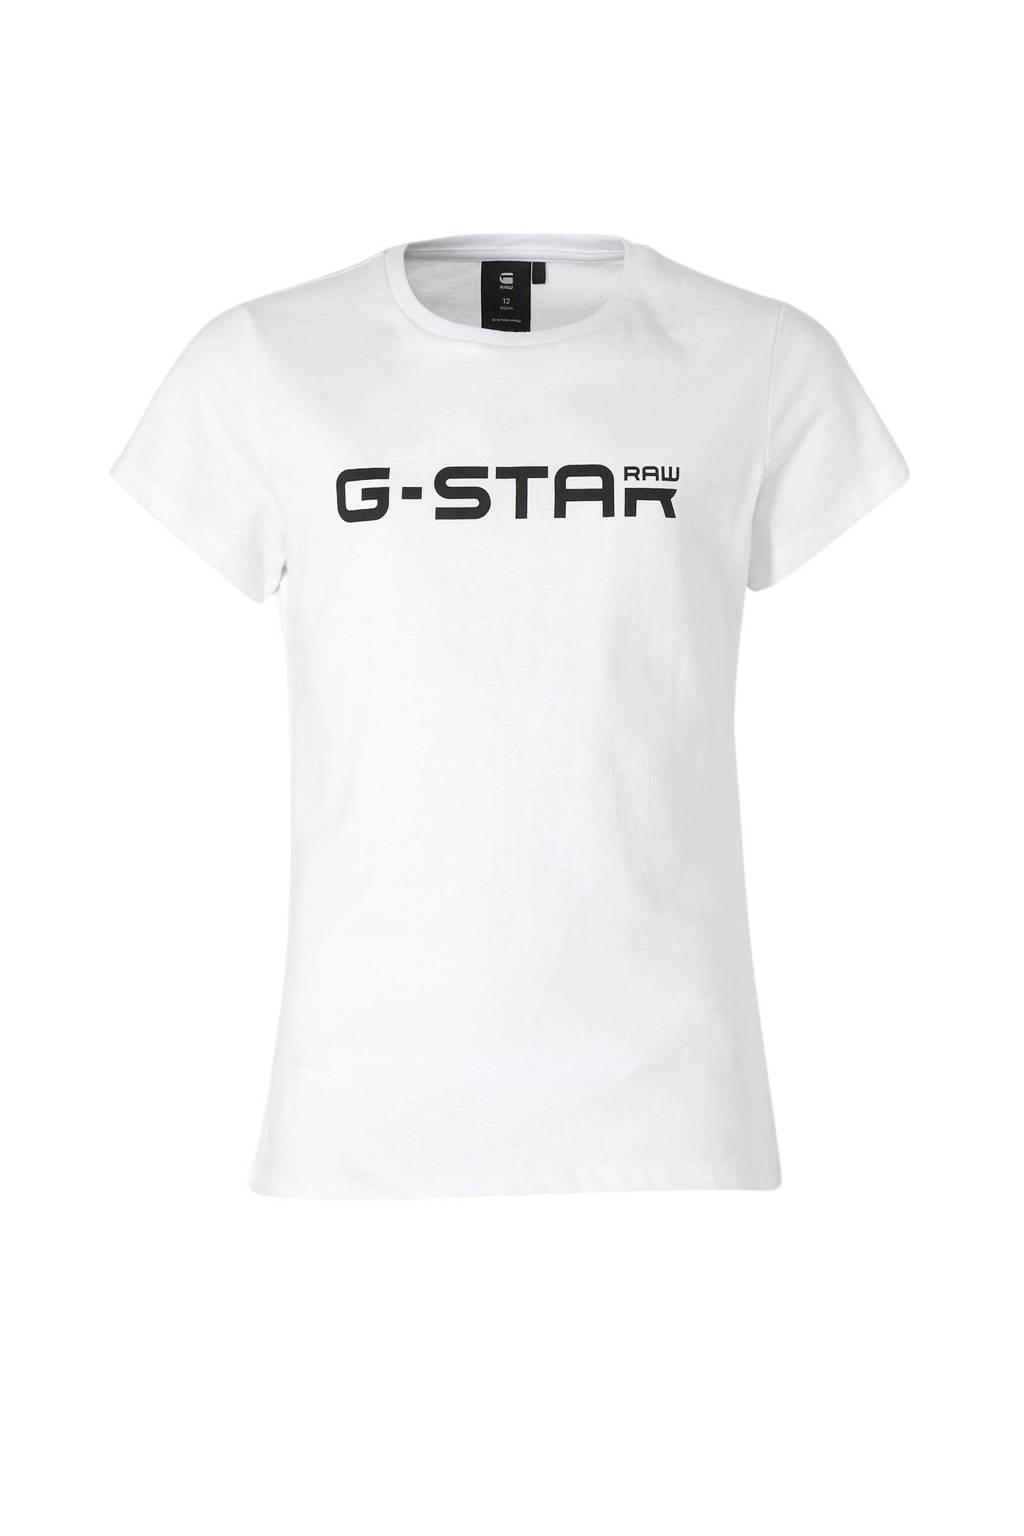 G-Star RAW T-shirt met logo wit/zwart, Wit/zwart